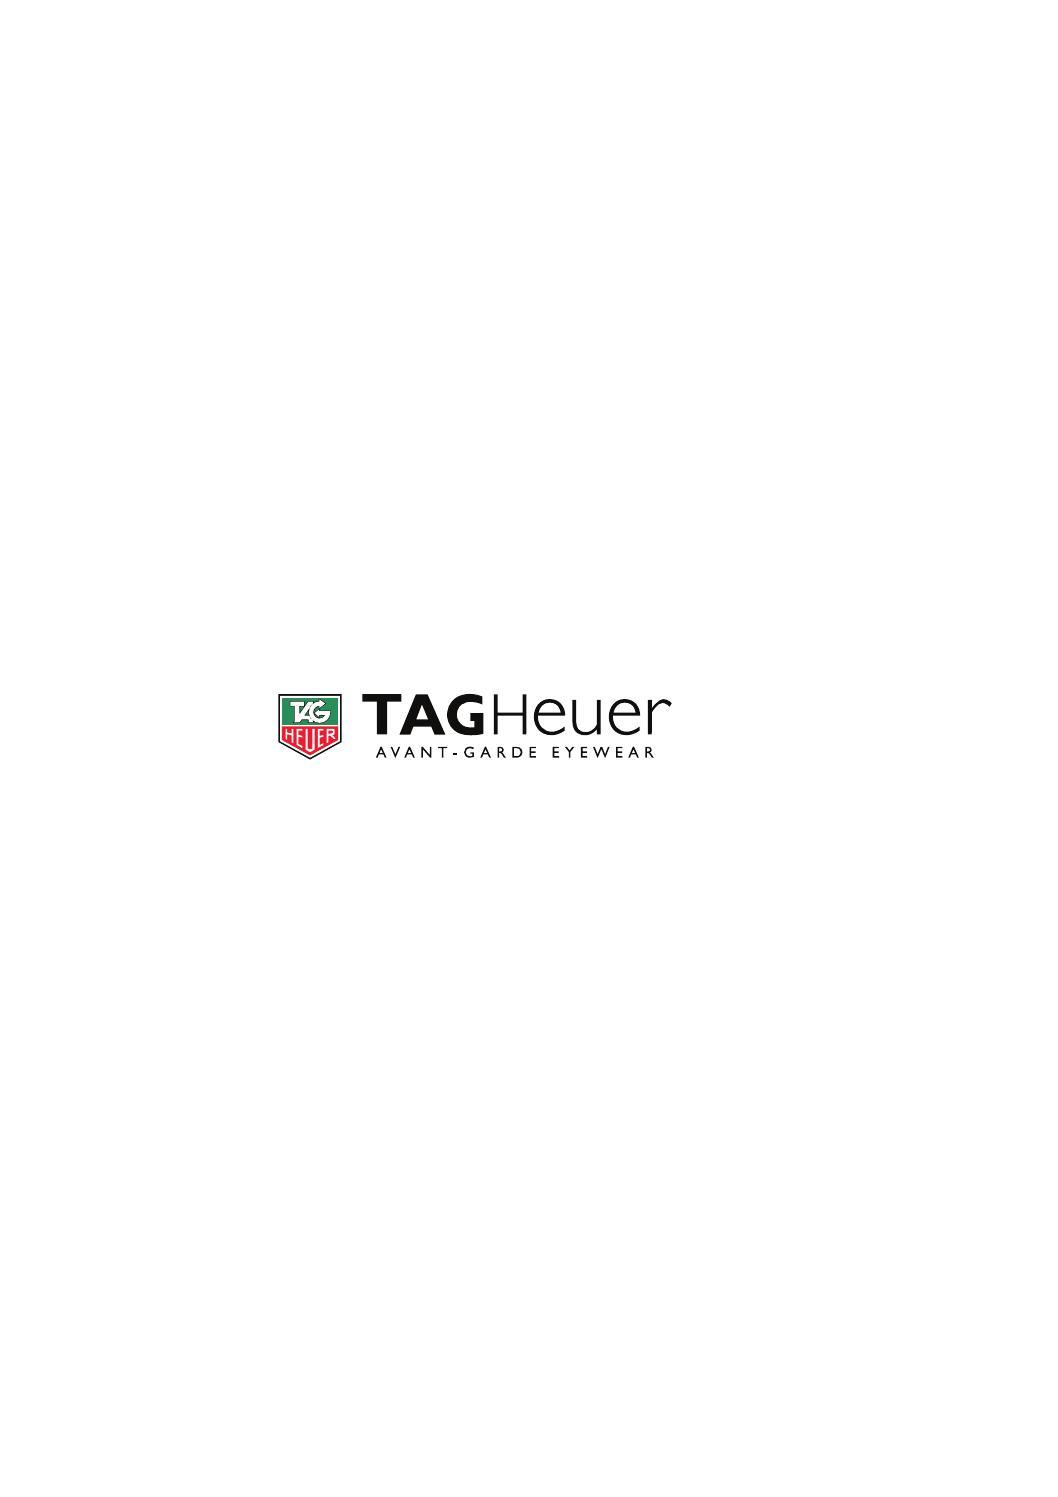 b6ca18bdb29da TAG HEUER Avangard Eyewear 2012 by РЕСПЕКТОПТИКА - issuu